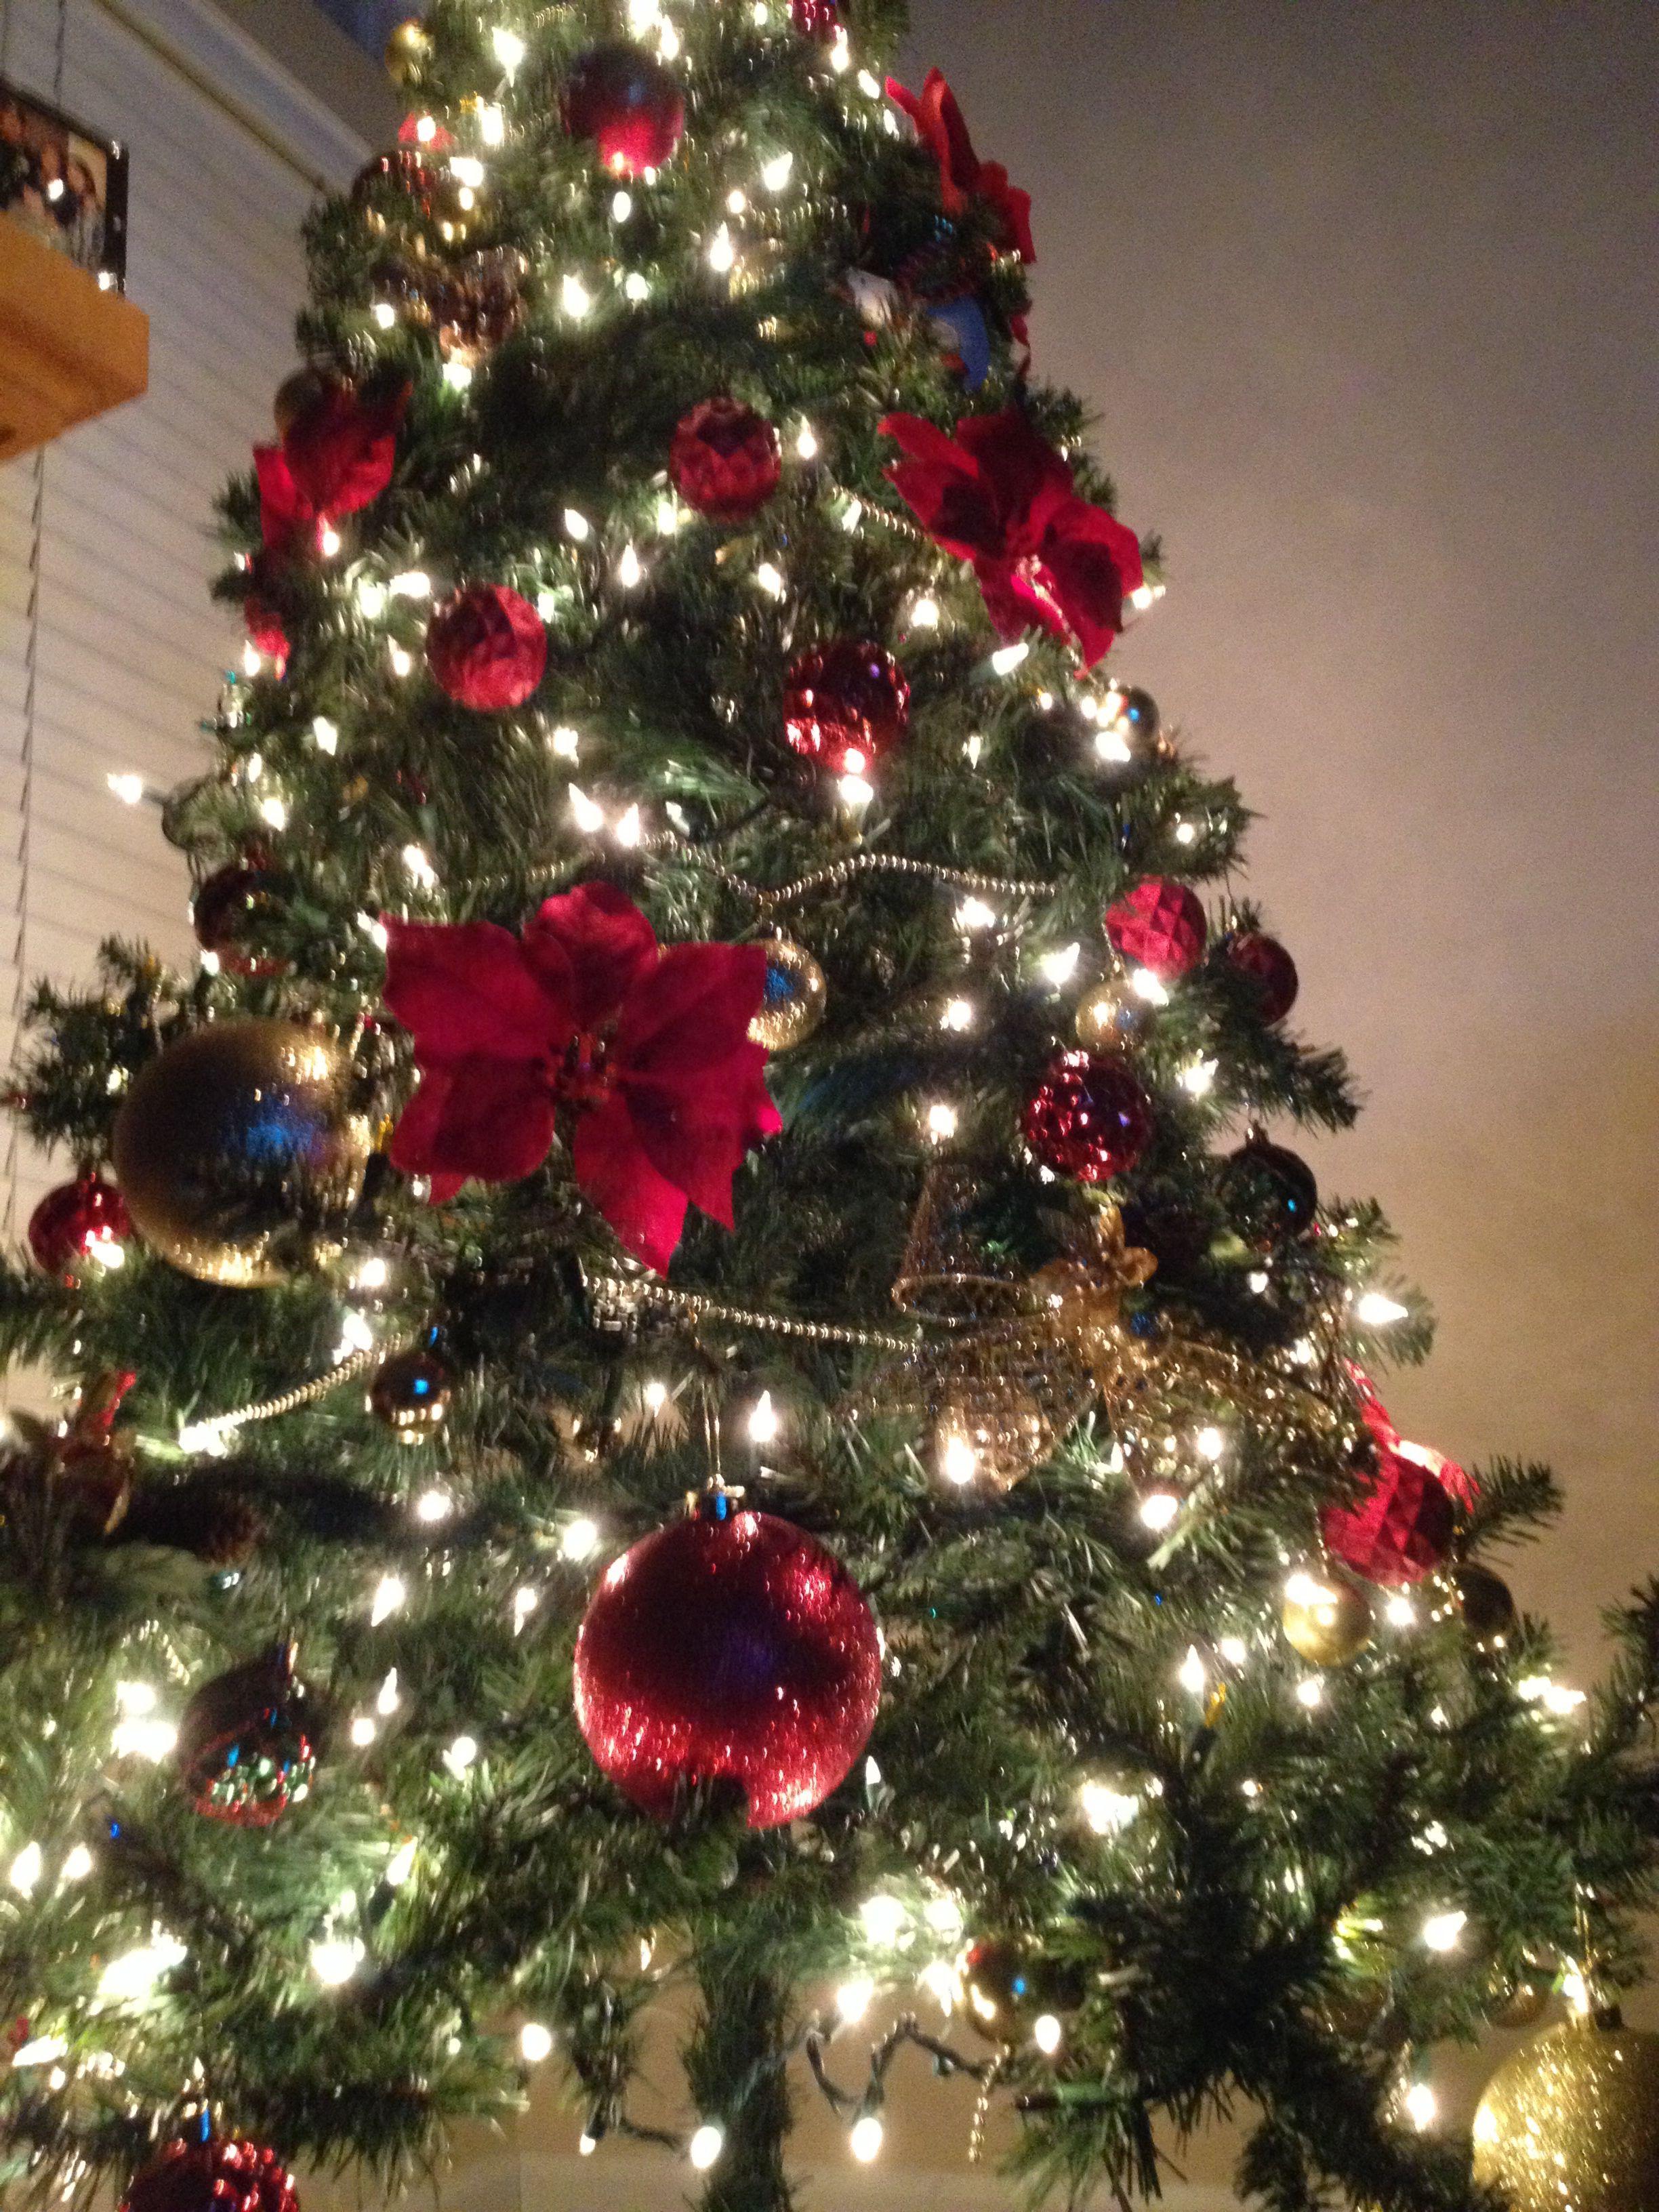 My Christmas Tree Decor All From Dollar Tree